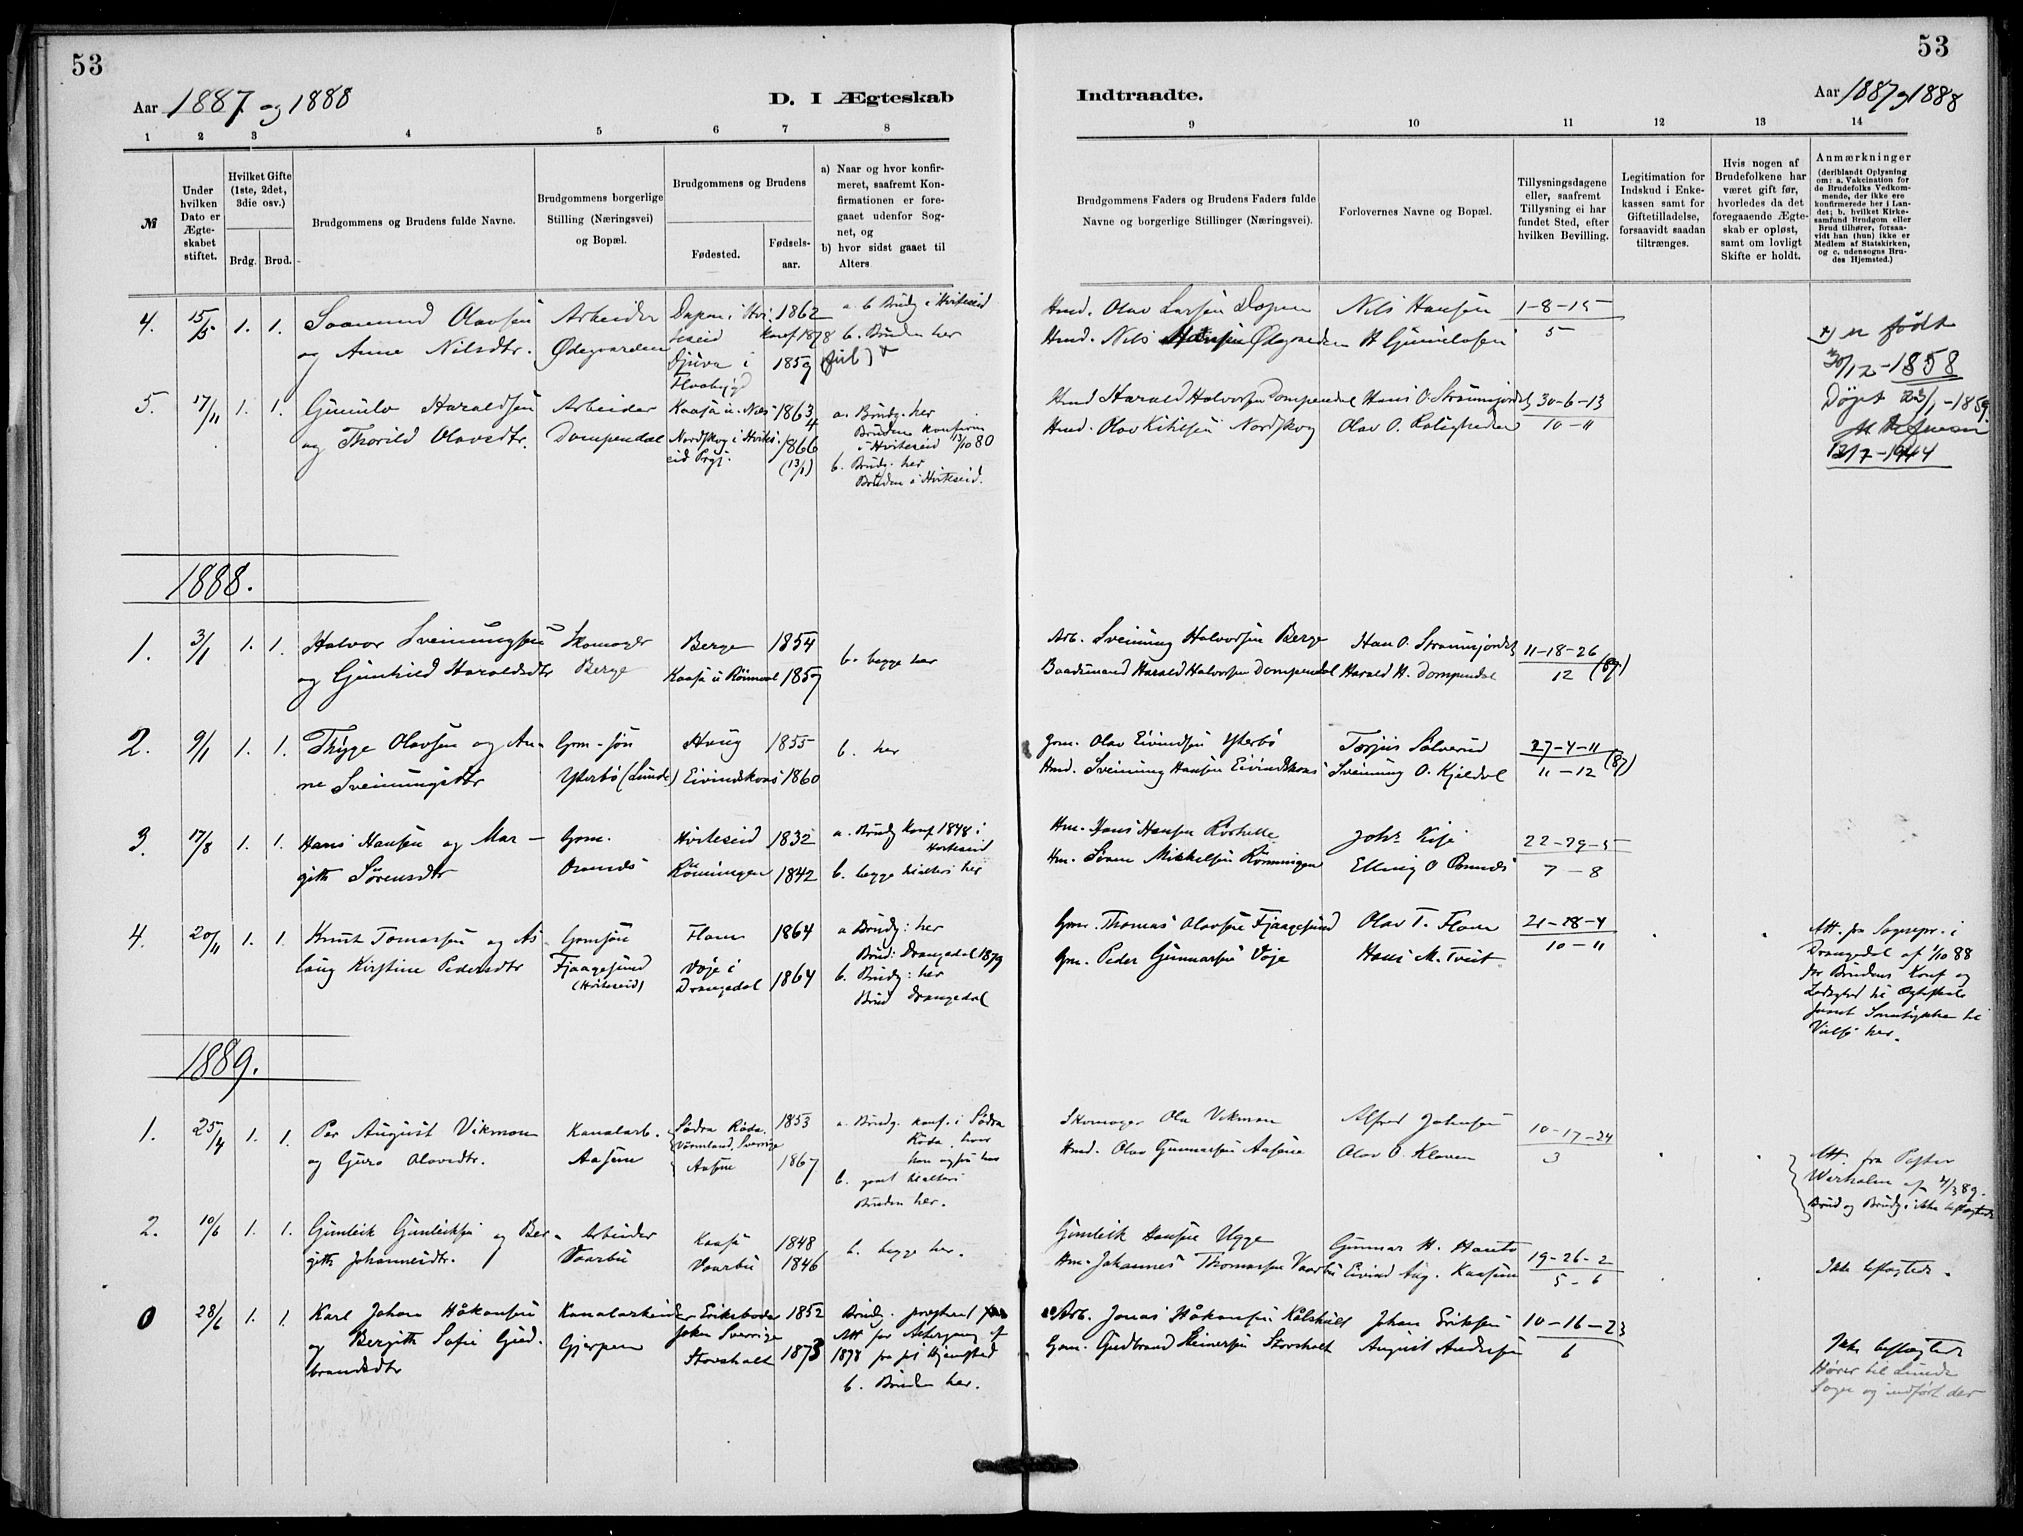 SAKO, Lunde kirkebøker, F/Fb/L0003: Ministerialbok nr. II 3, 1882-1891, s. 53